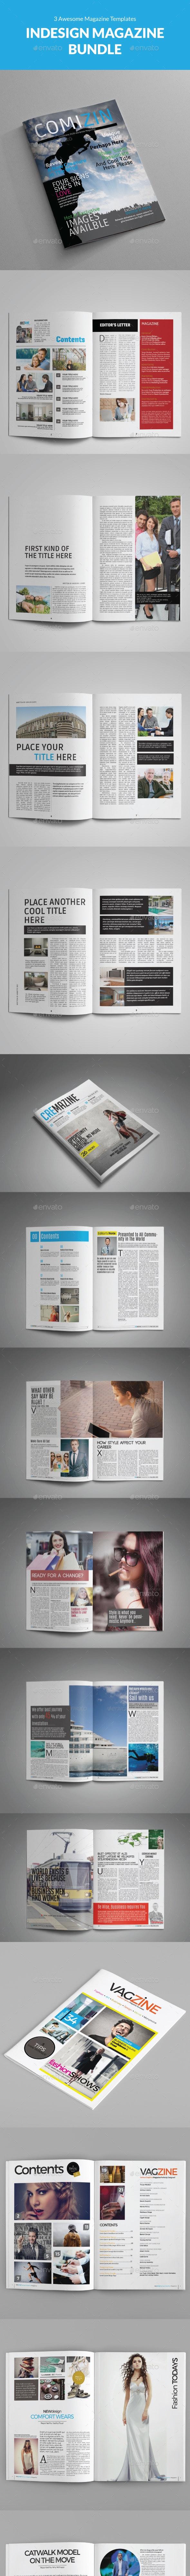 Magazine Bundle Vol.04 - Magazines Print Templates